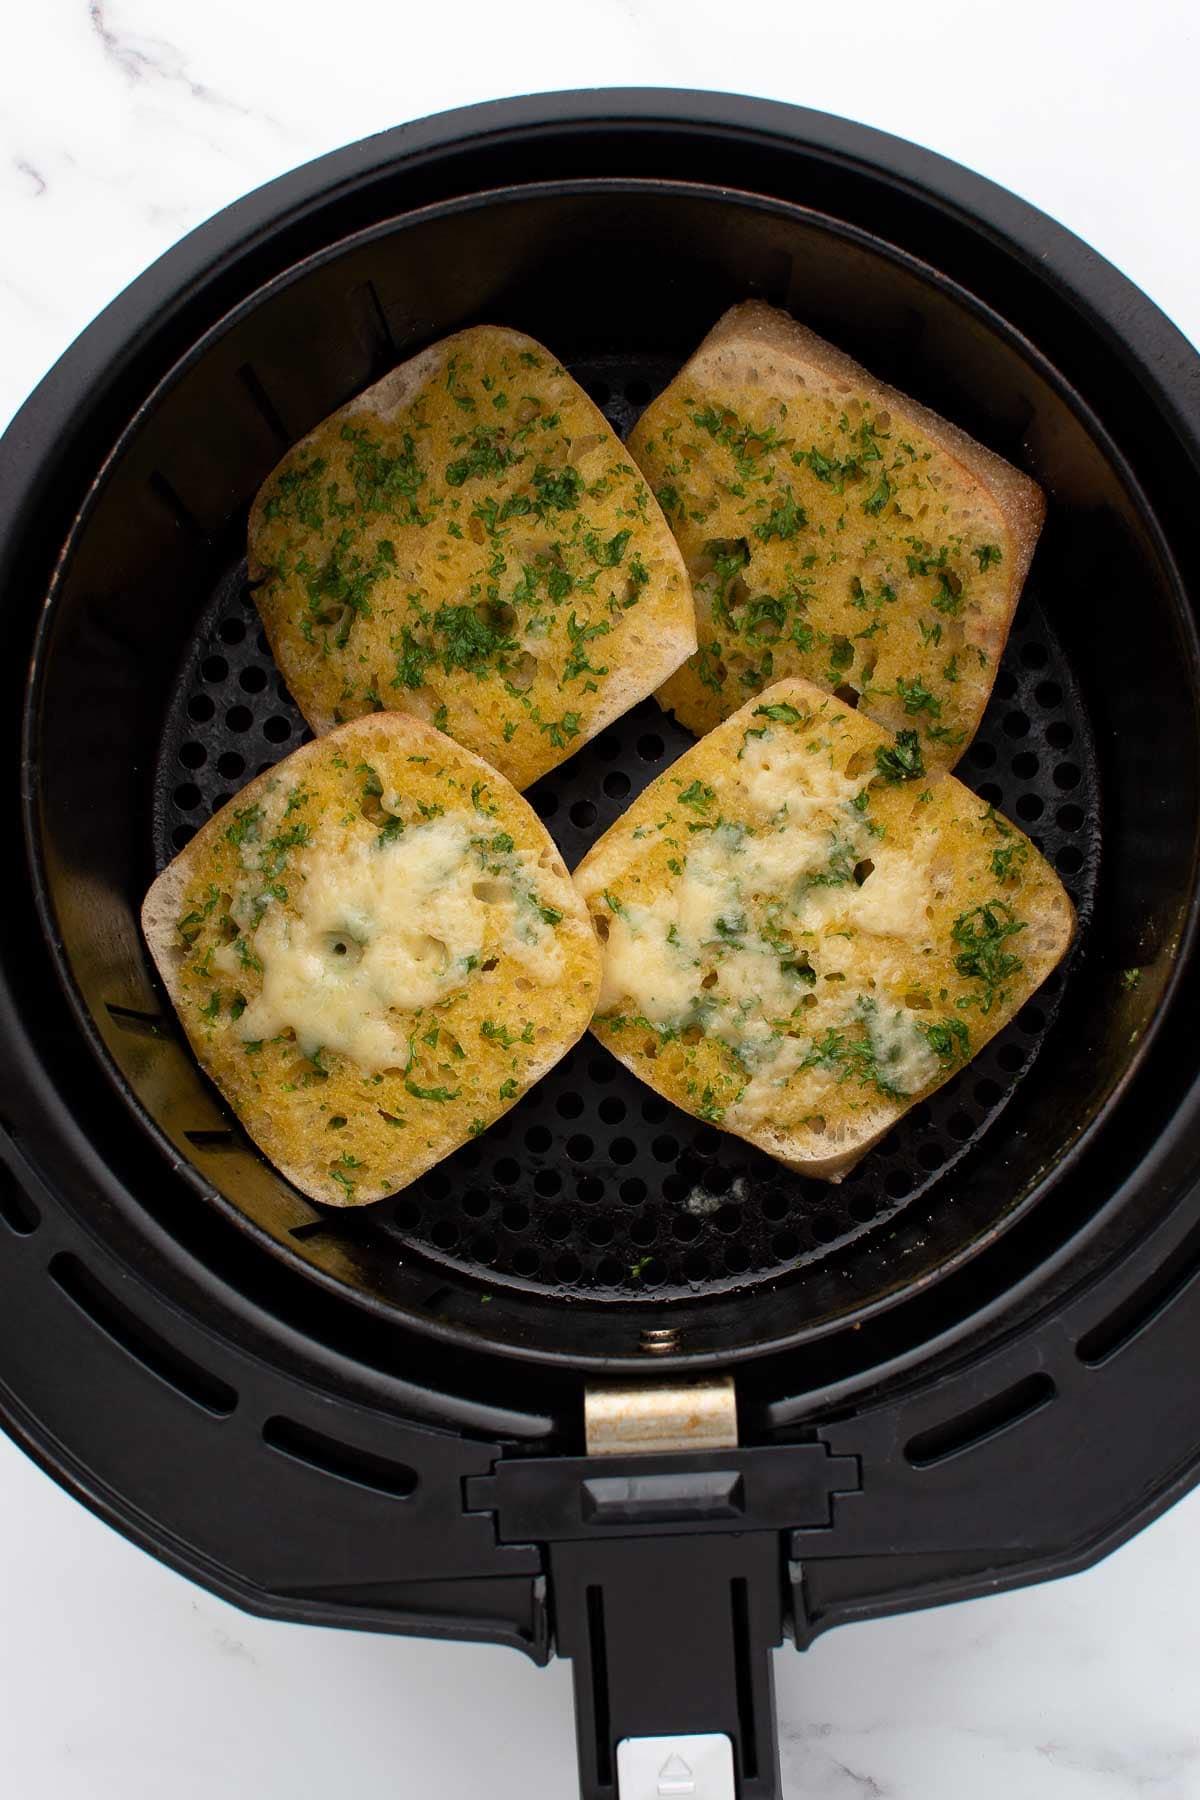 Garlic bread in an air fryer.